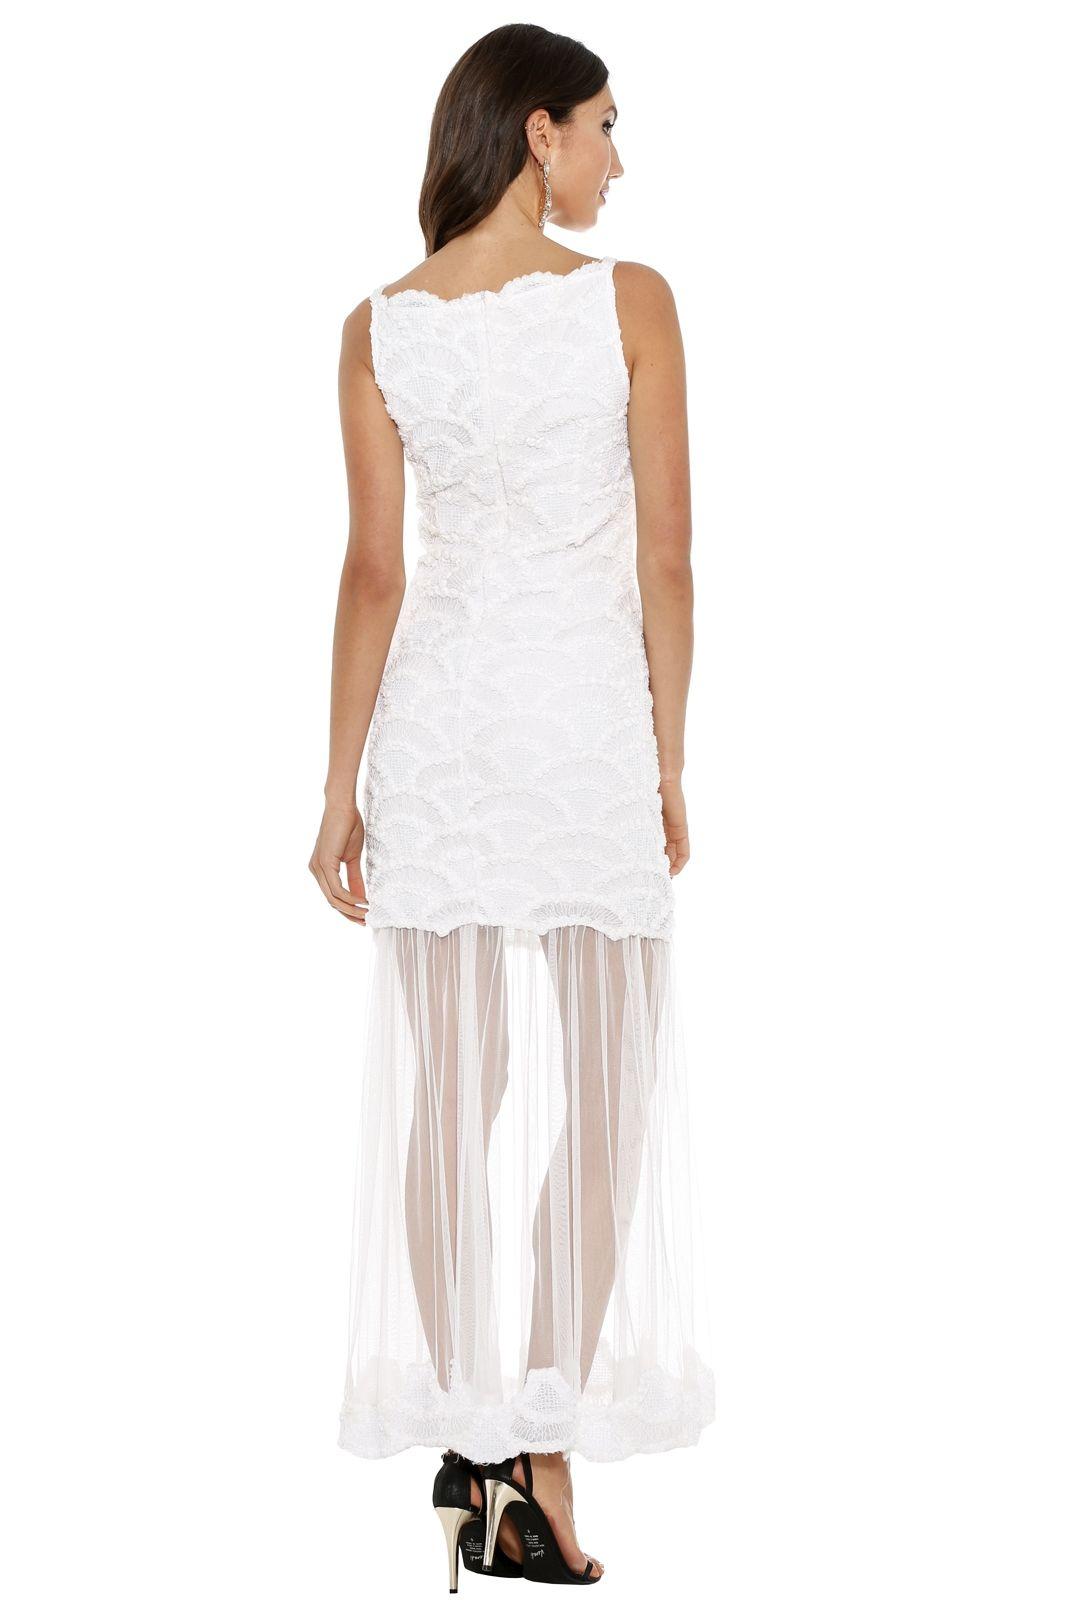 Asilio - An English Summer Dress - White - Back